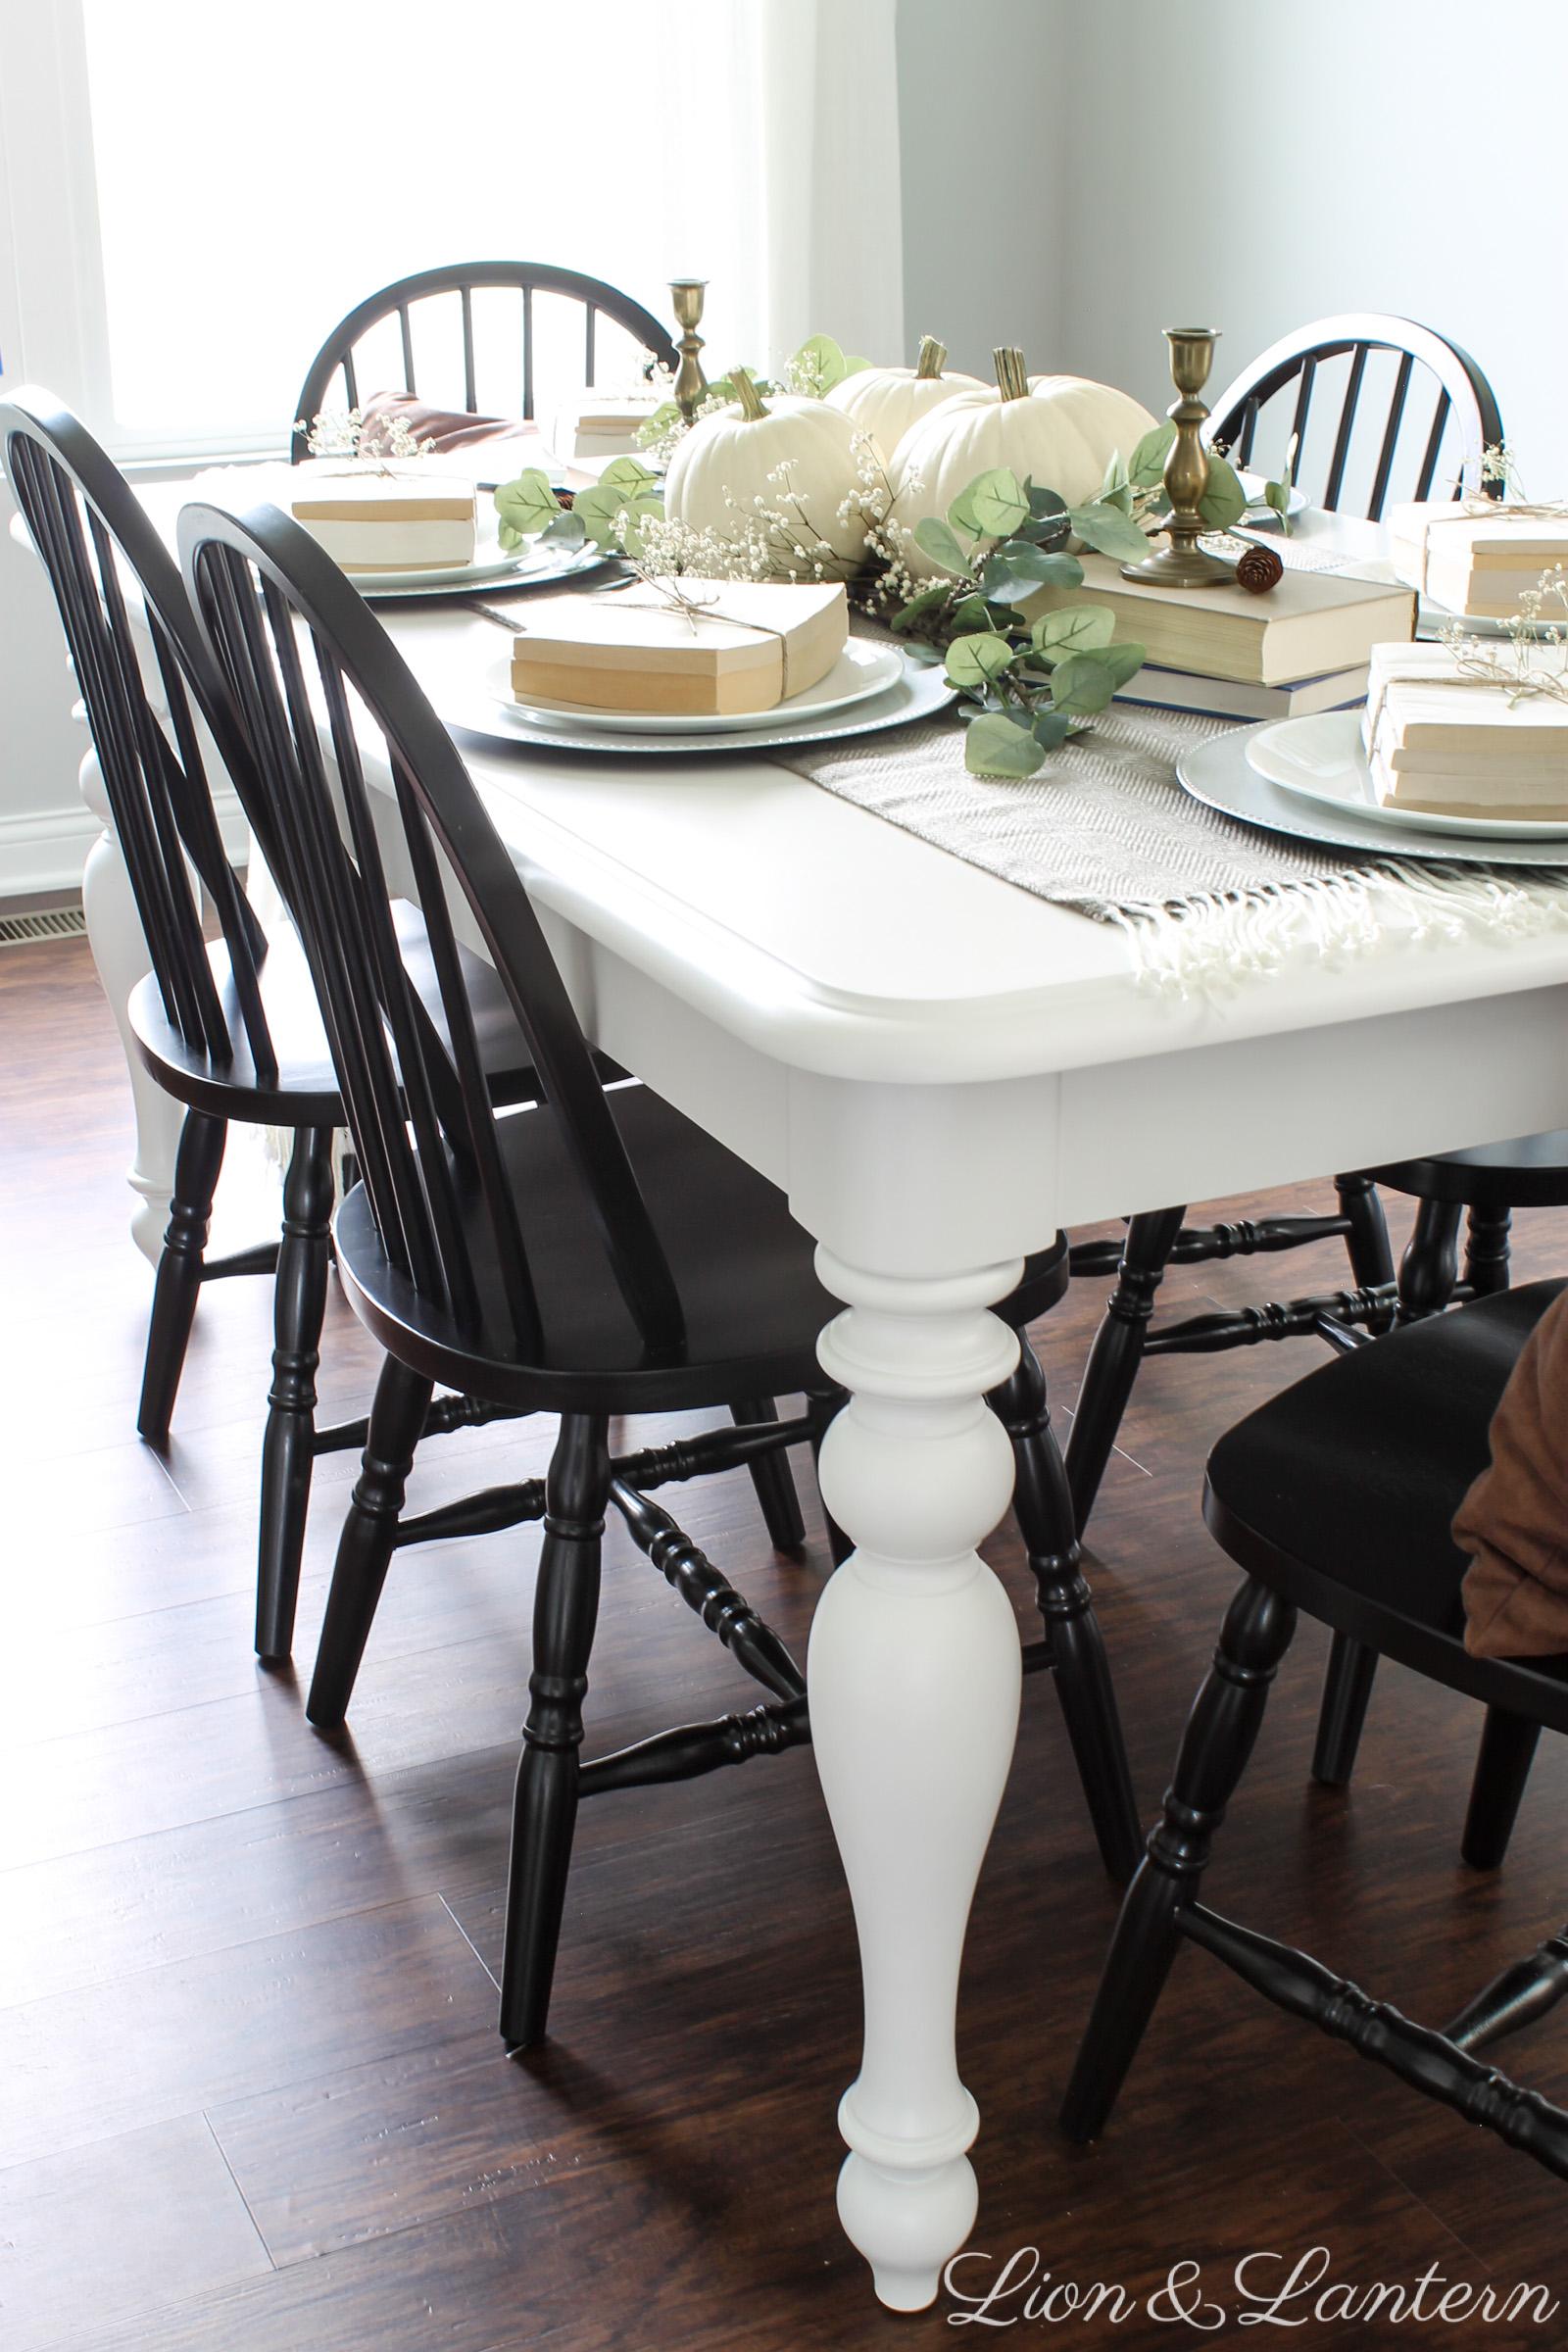 Thanksgiving Tablescape at LionAndLantern.com. Farmhouse Thanksgiving, Thanksgiving table decor, holiday decor, neutral, budget, eucalyptus, white pumpkins, book bundles, black chairs, white table.